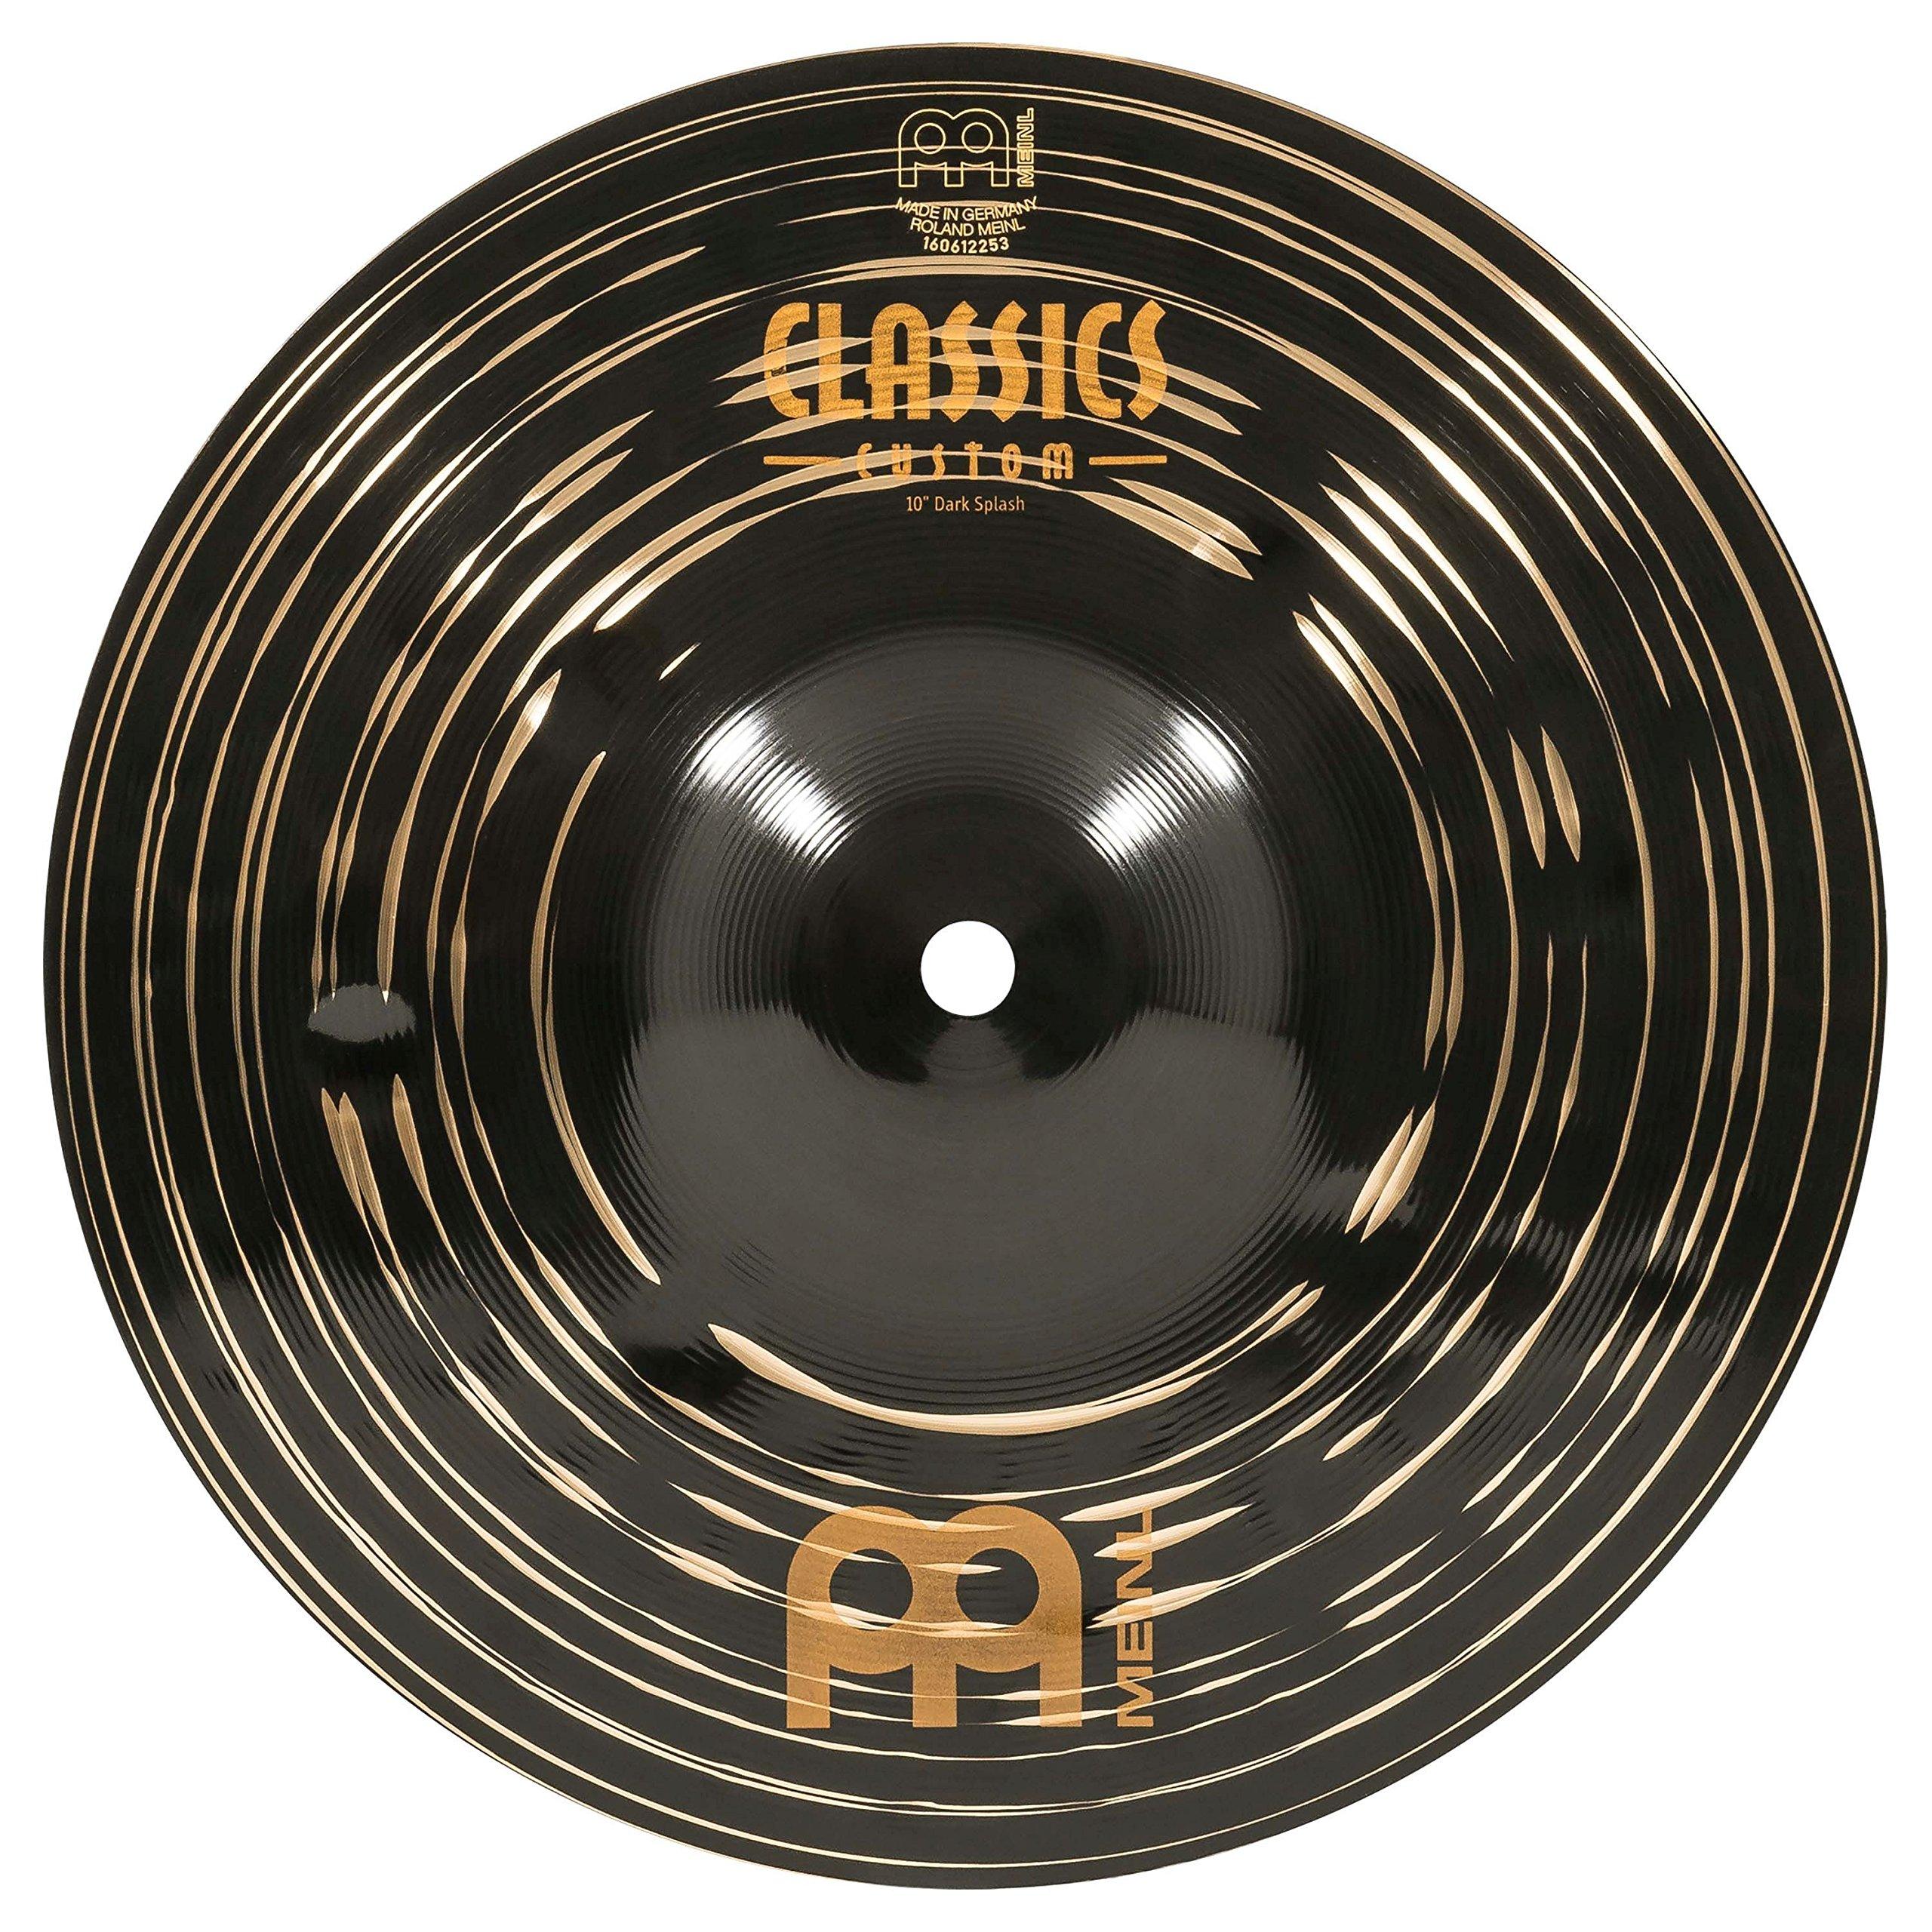 Meinl 10'' Splash Cymbal - Classics Custom Dark - Made in Germany, 2-YEAR WARRANTY (CC10DAS) by Meinl Cymbals